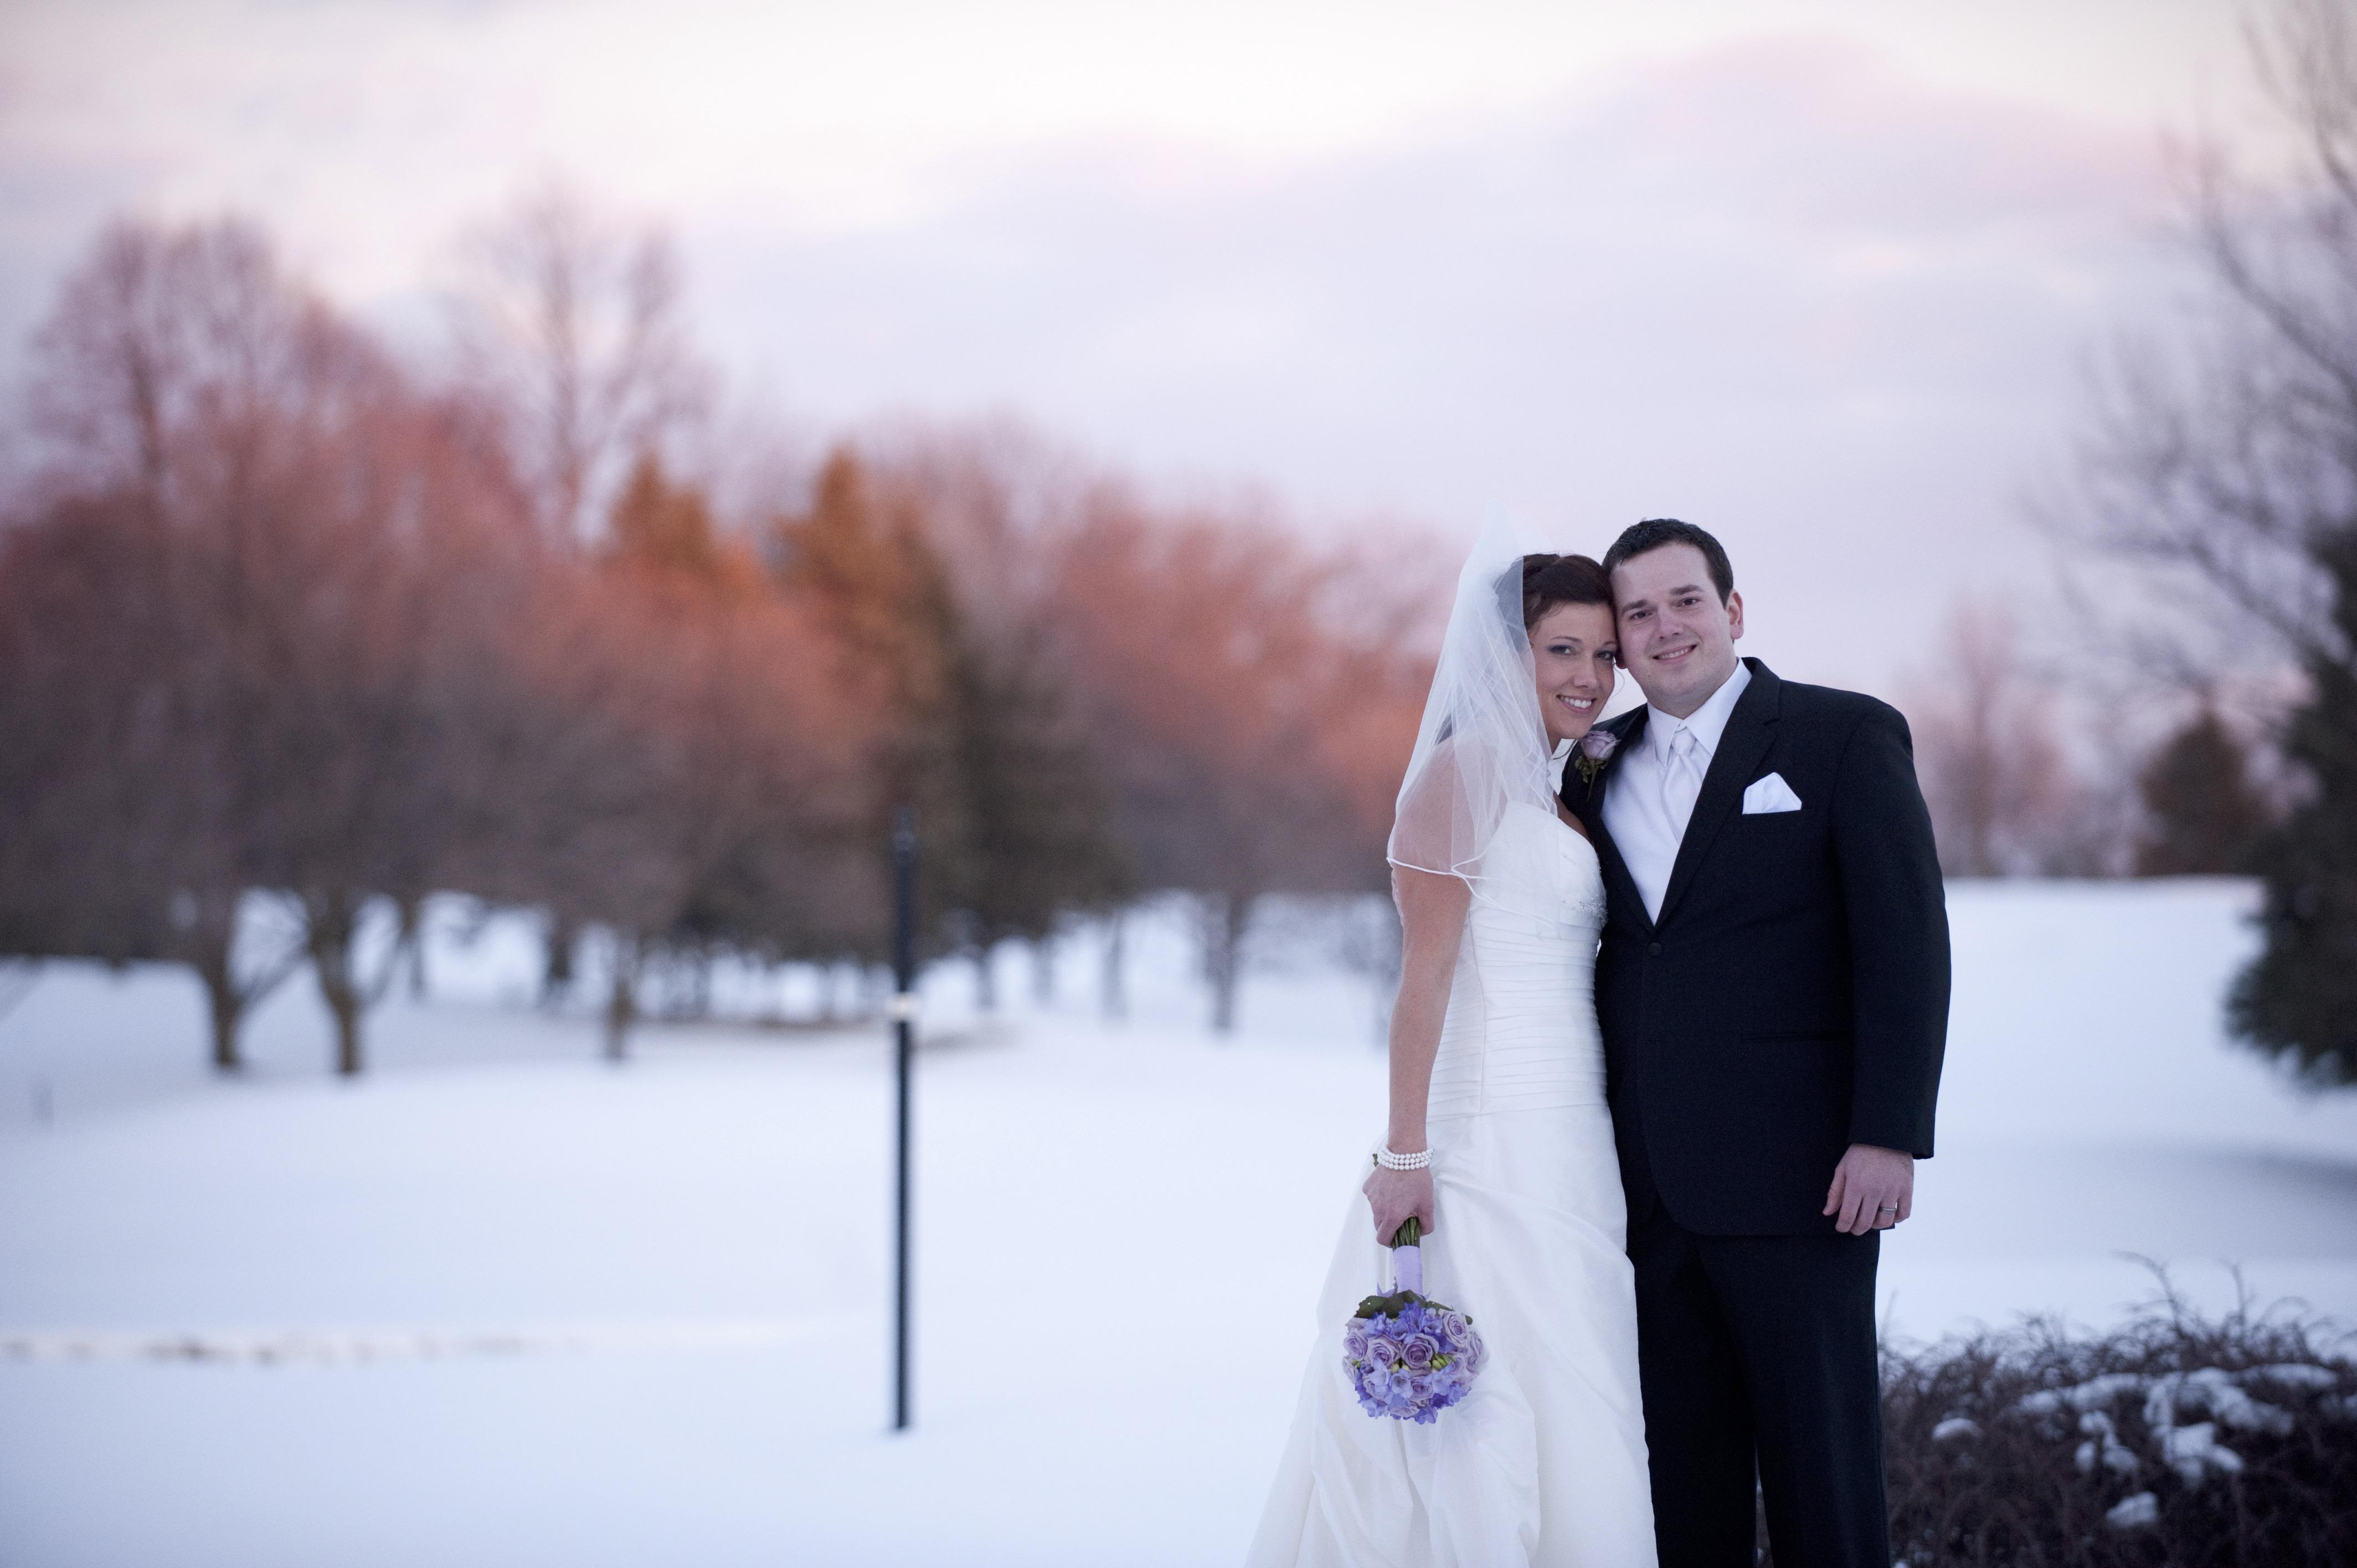 Wedding-Studio-Schaumburg-Illinois-x2.jpg